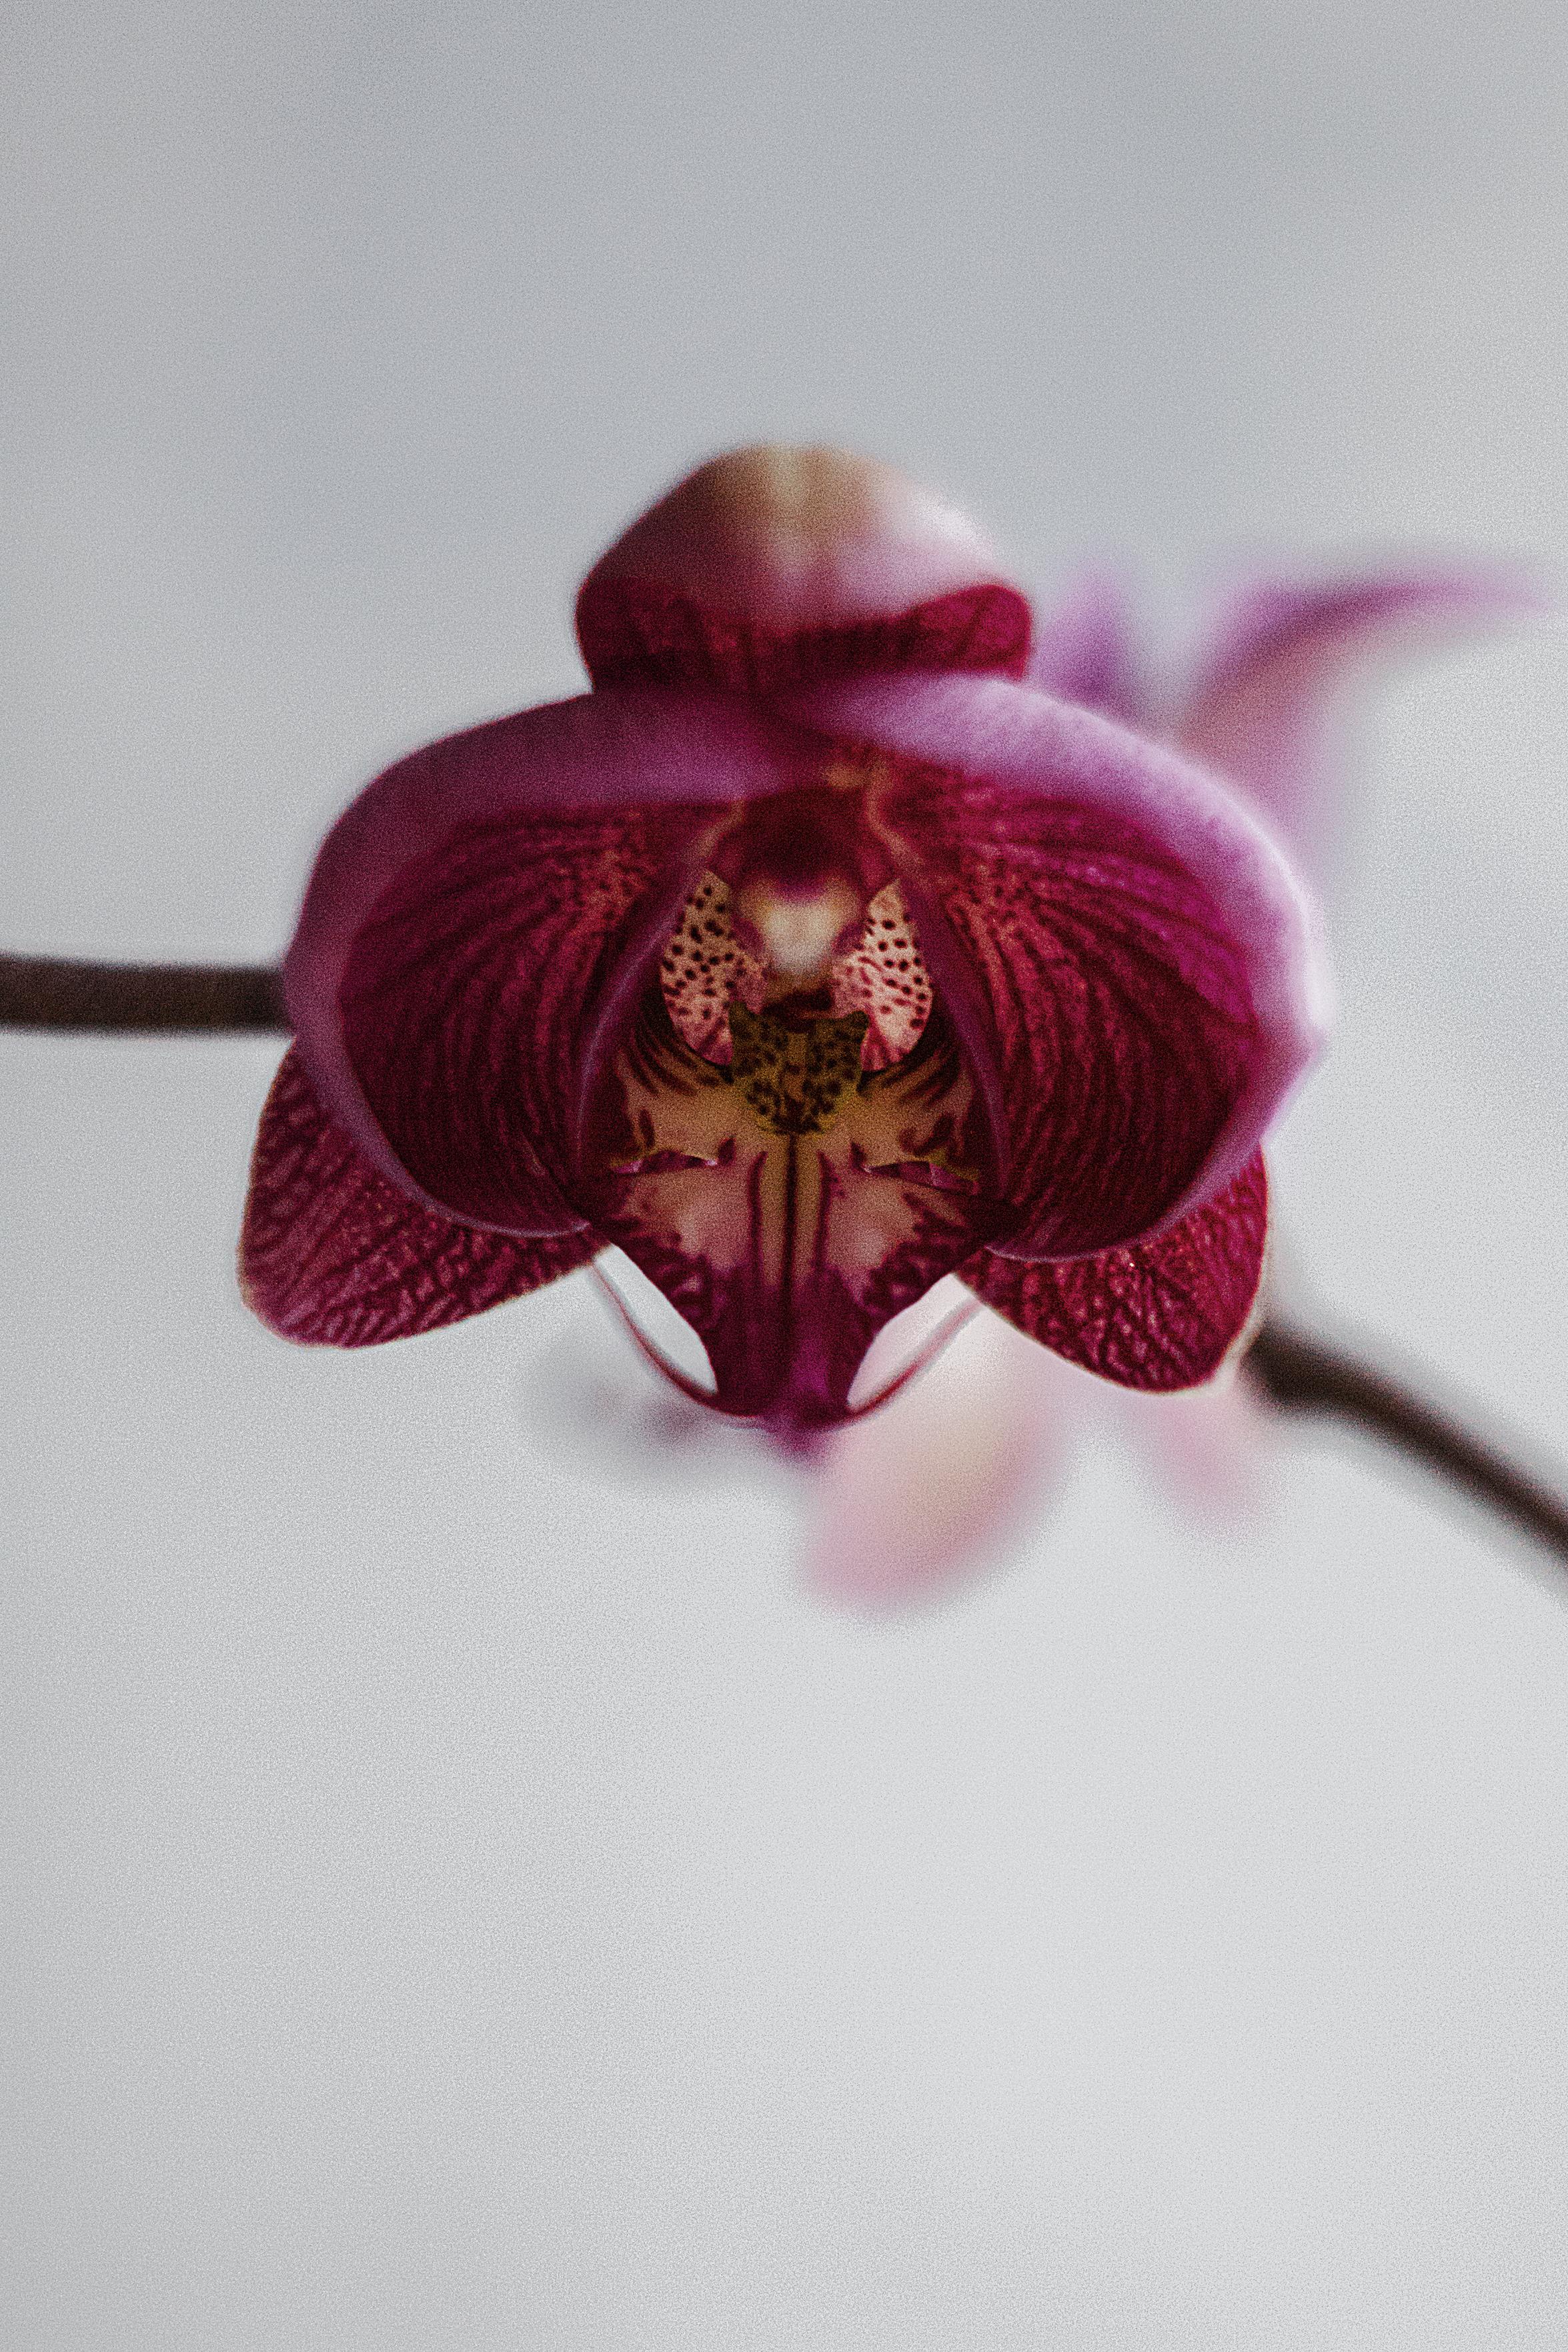 Free Images : blossom, winter, blur, growth, leaf, flower, purple ...